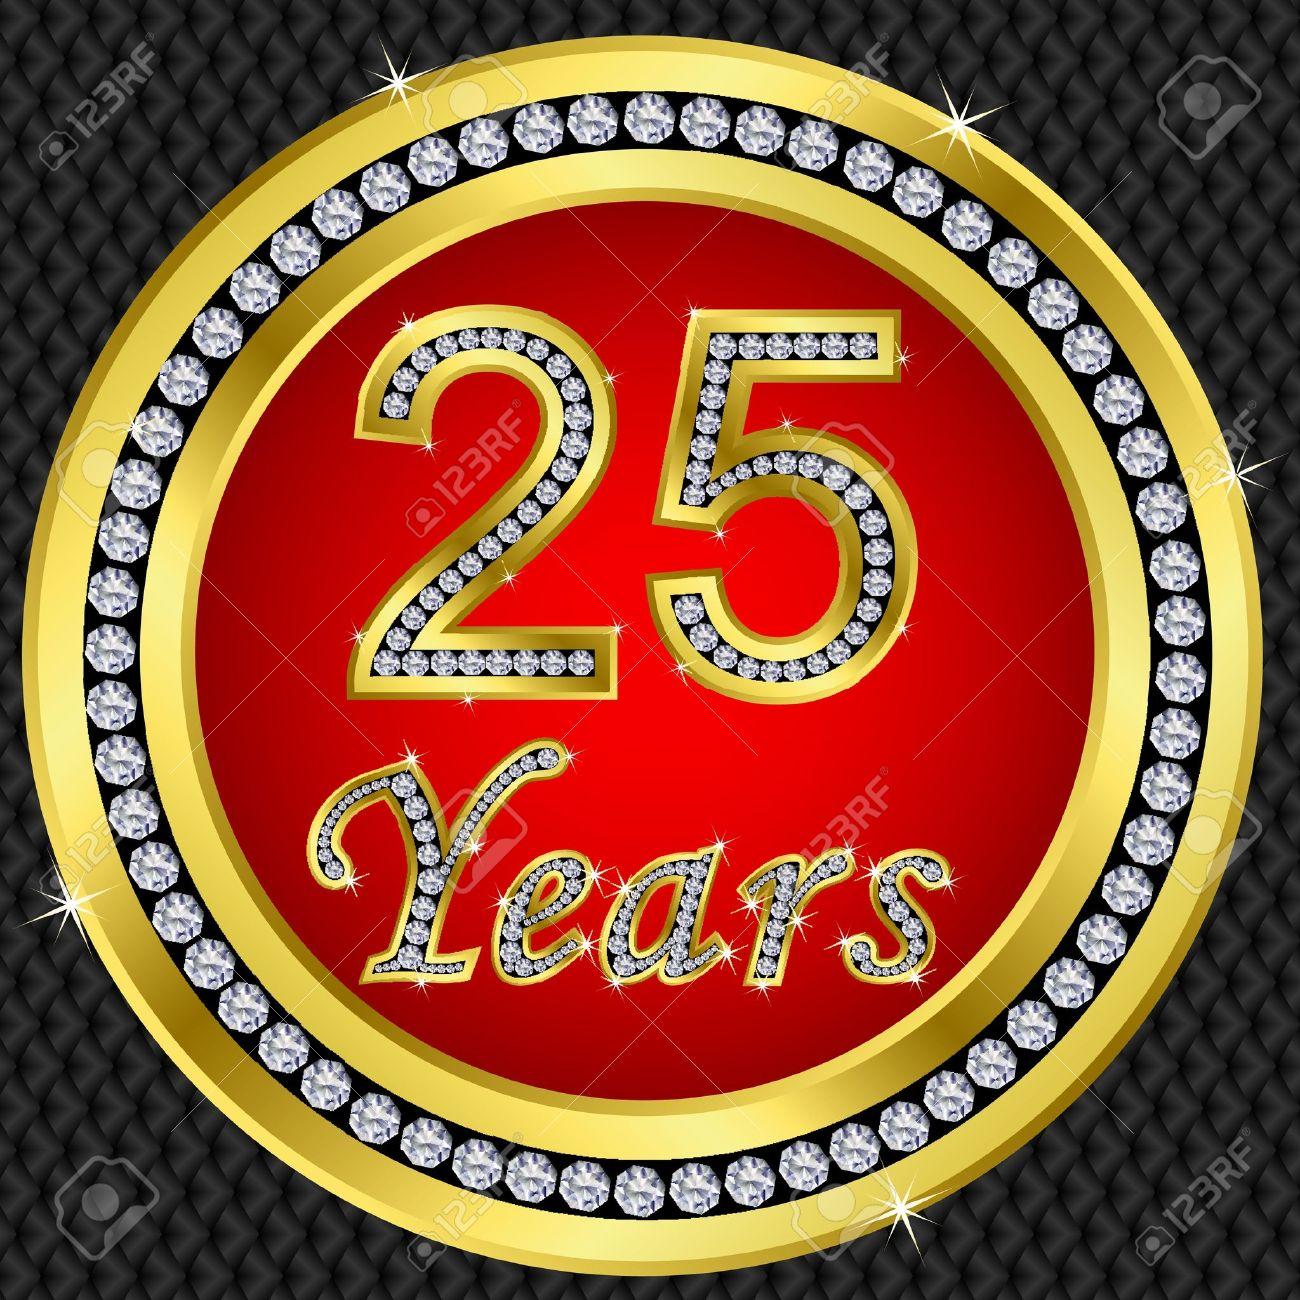 25 years anniversary golden happy birthday icon with diamonds, vector illustration Stock Vector - 11860274